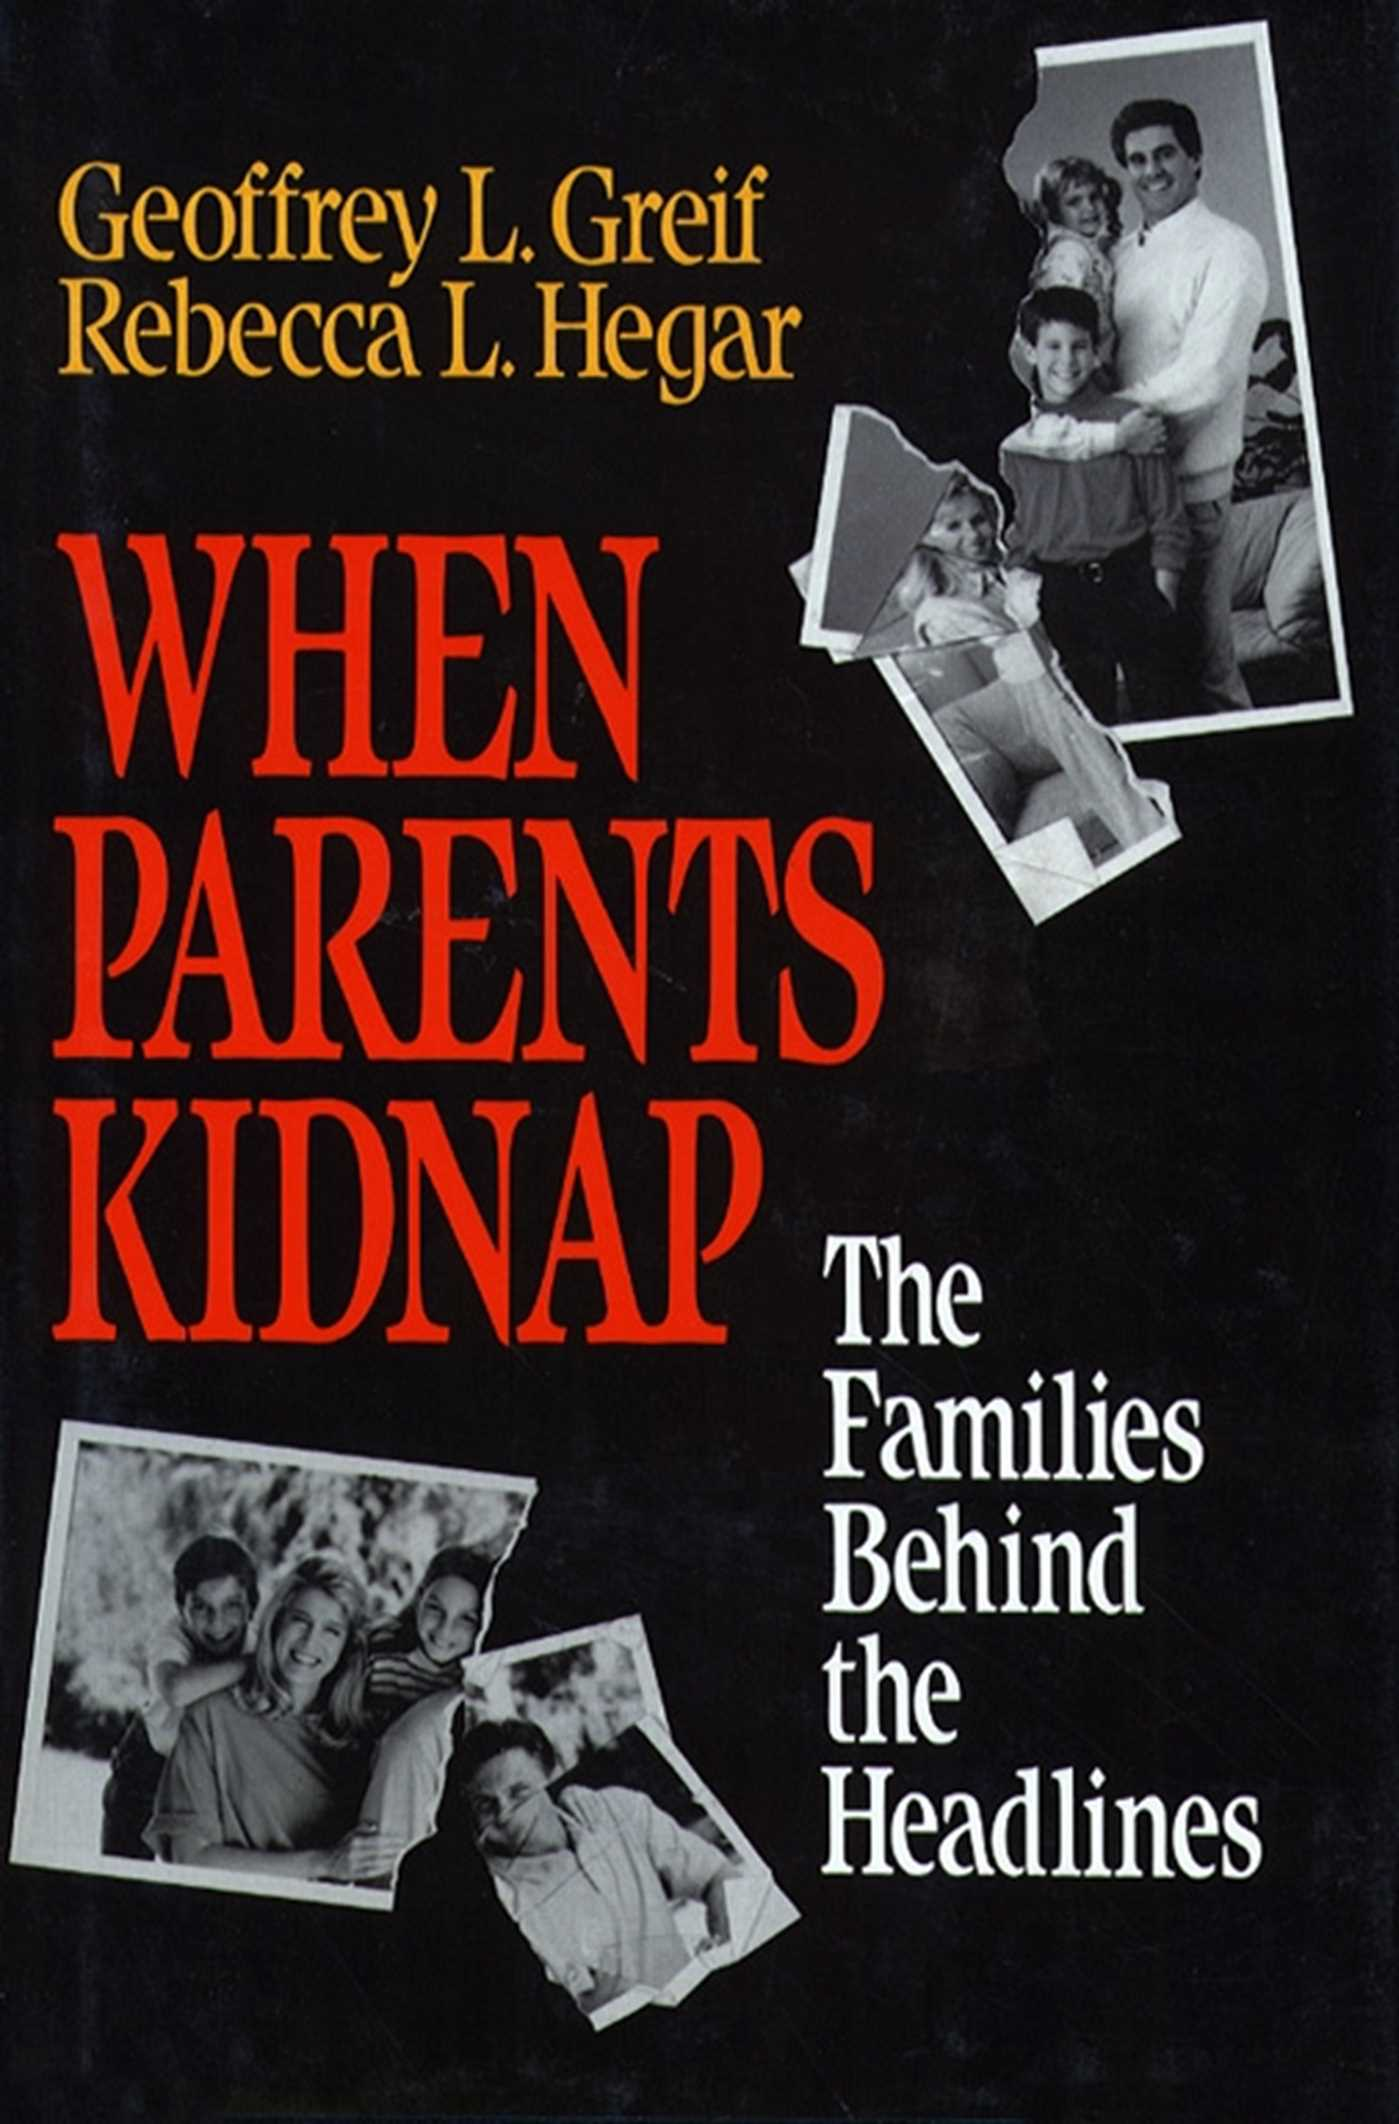 When parents kidnap 9781451602357 hr